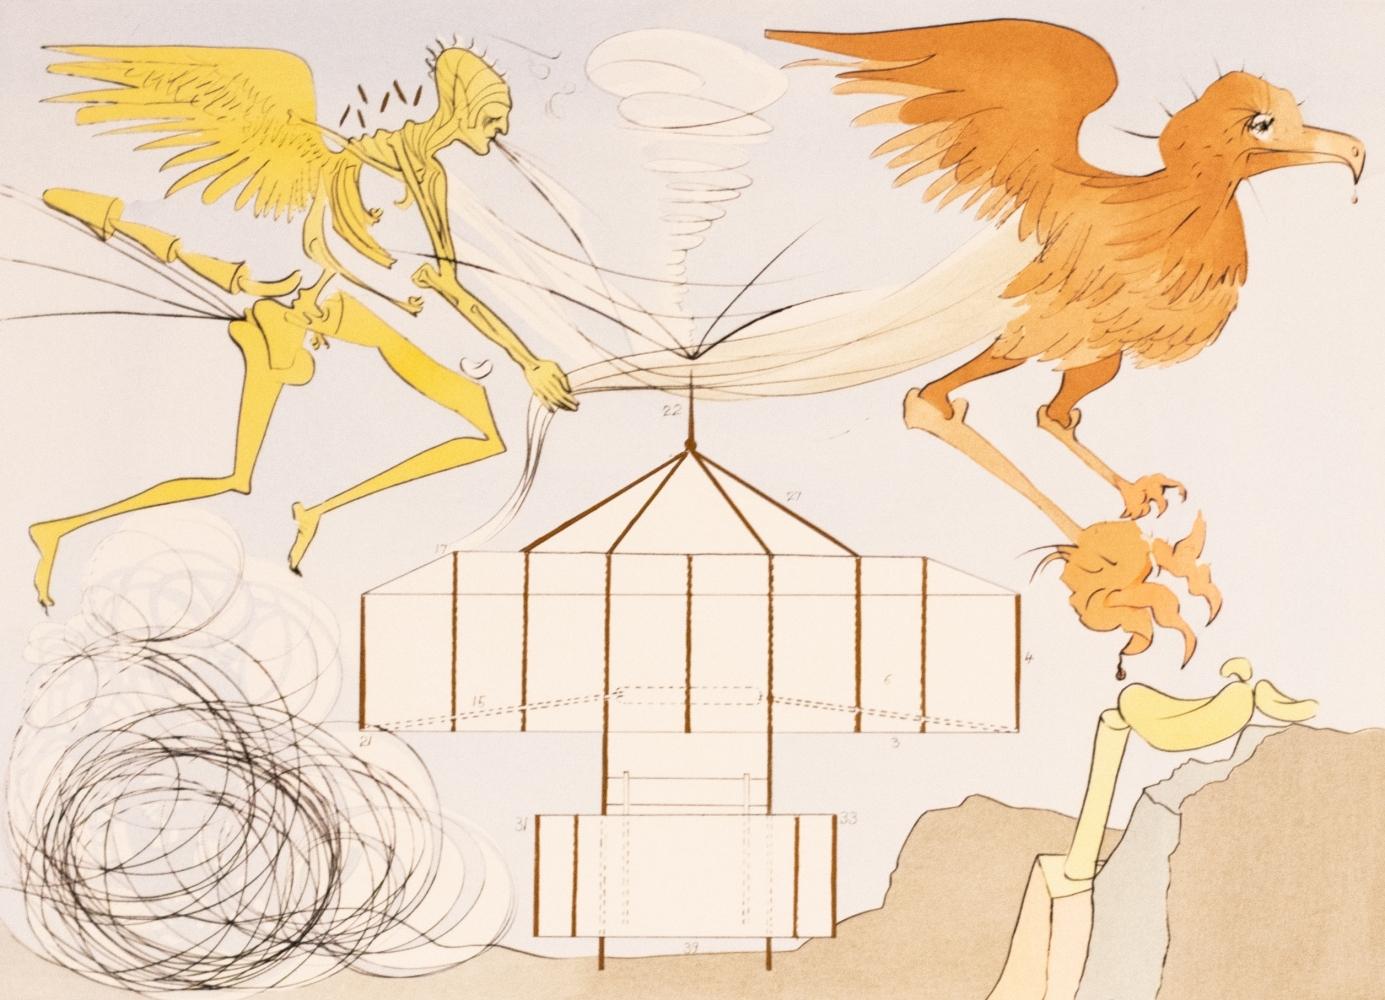 Salvador Dali, L'aeroplane, From Homage a Leonardo da Vinci, 1975, Engraving with Pochoir on Arches paper, 22.25 × 29.88 inches, Salvador Dali signed print, Salvador Dali prints for sale